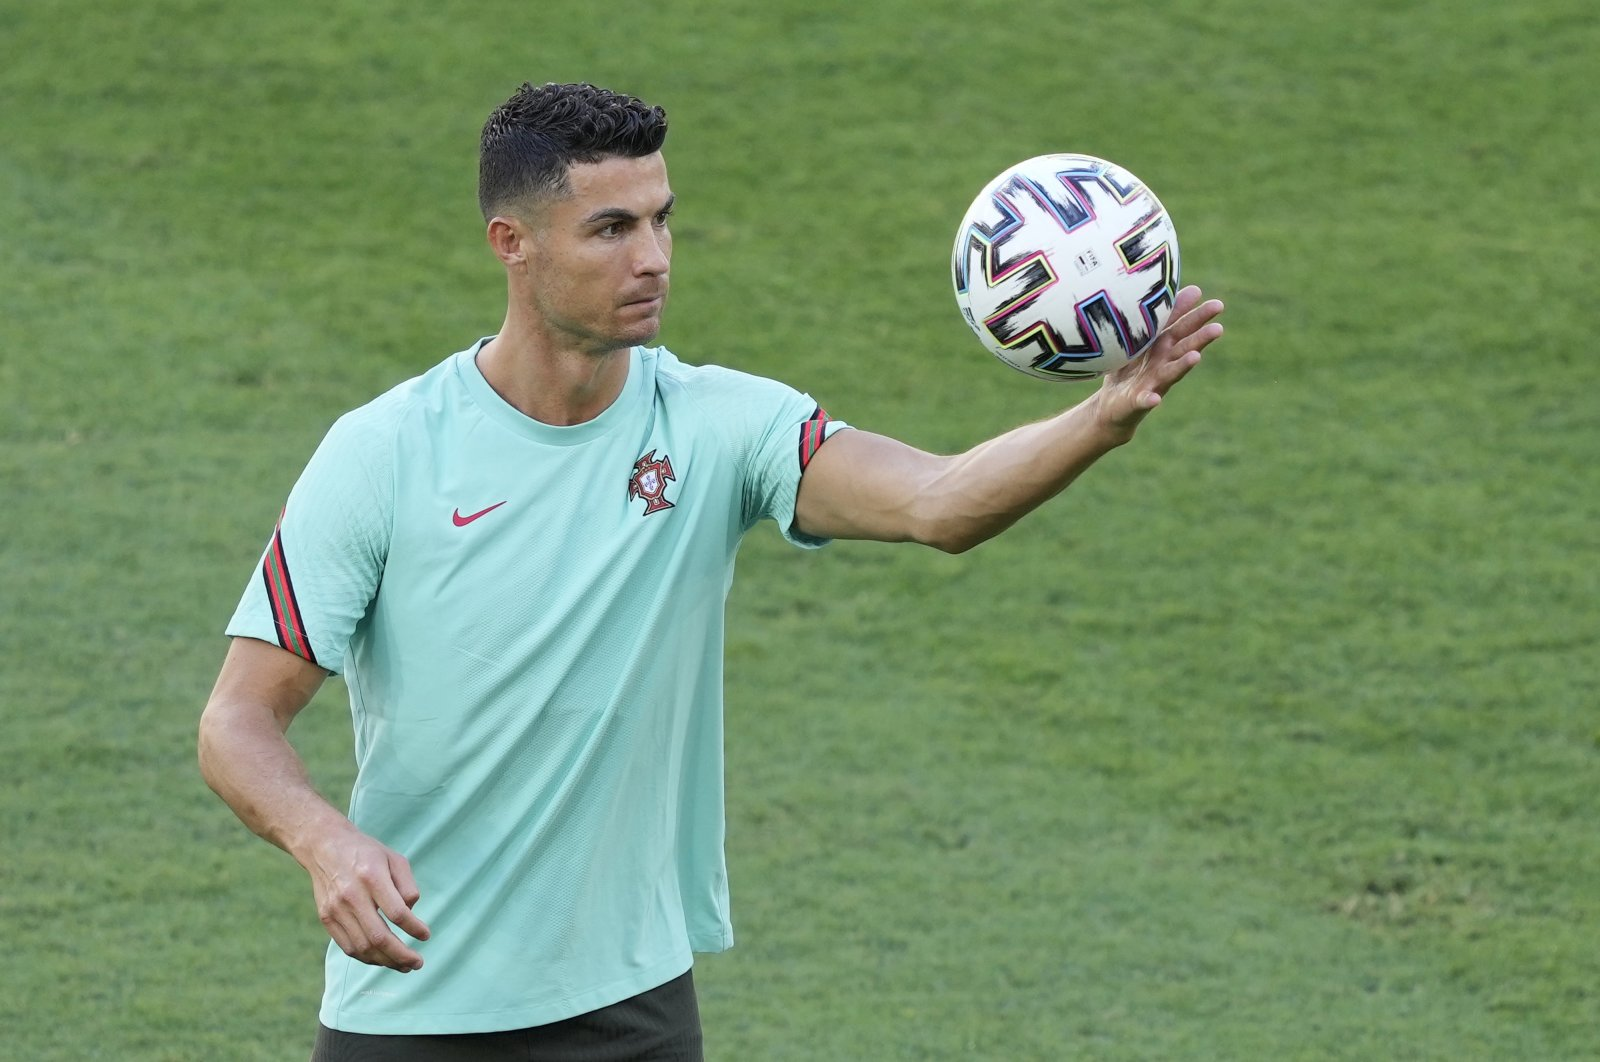 Portugal's Cristiano Ronaldo attends a training session in Seville, Spain, June 26, 2021. (EPA Photo)